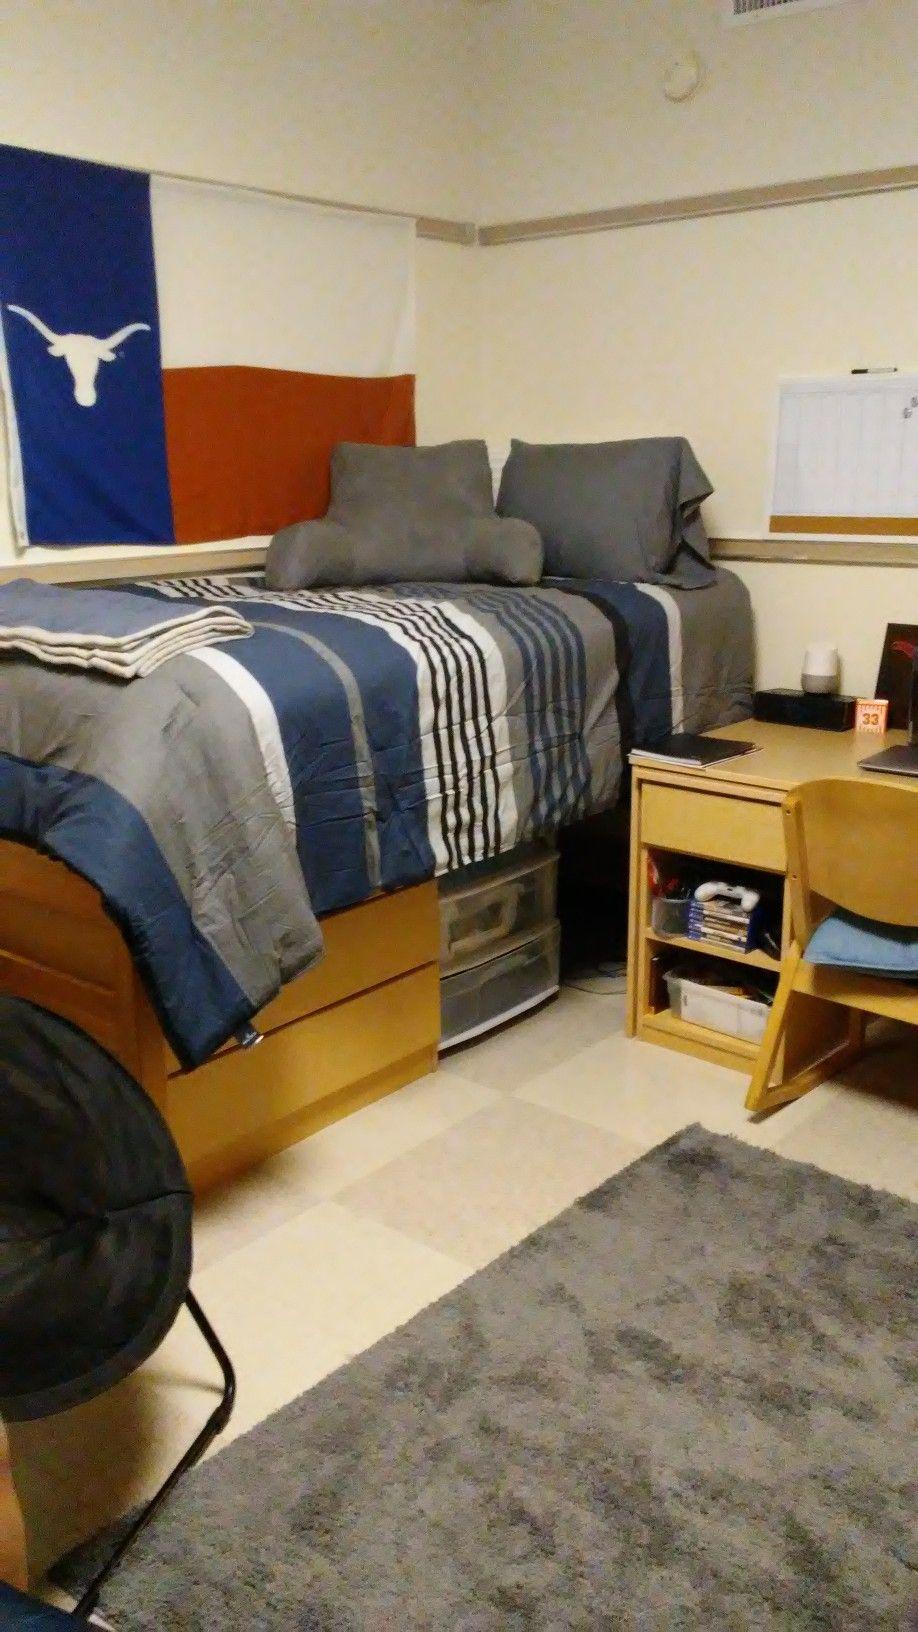 University Of Texas At Austin San Jacinto Dorm For My Son